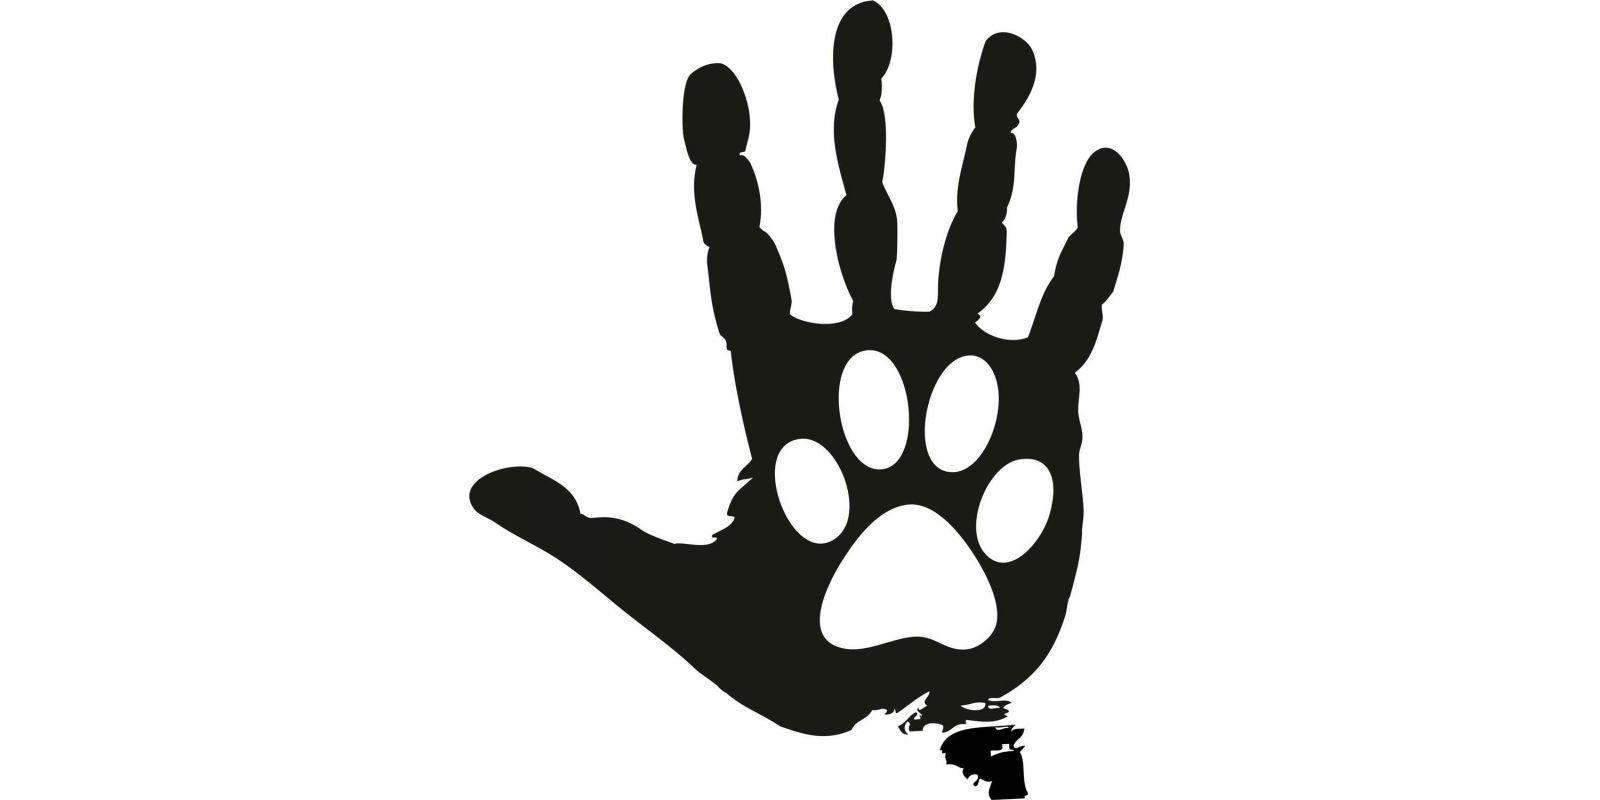 Pin Van Jackie Love Op Mind Dierenarts Honden Logo S